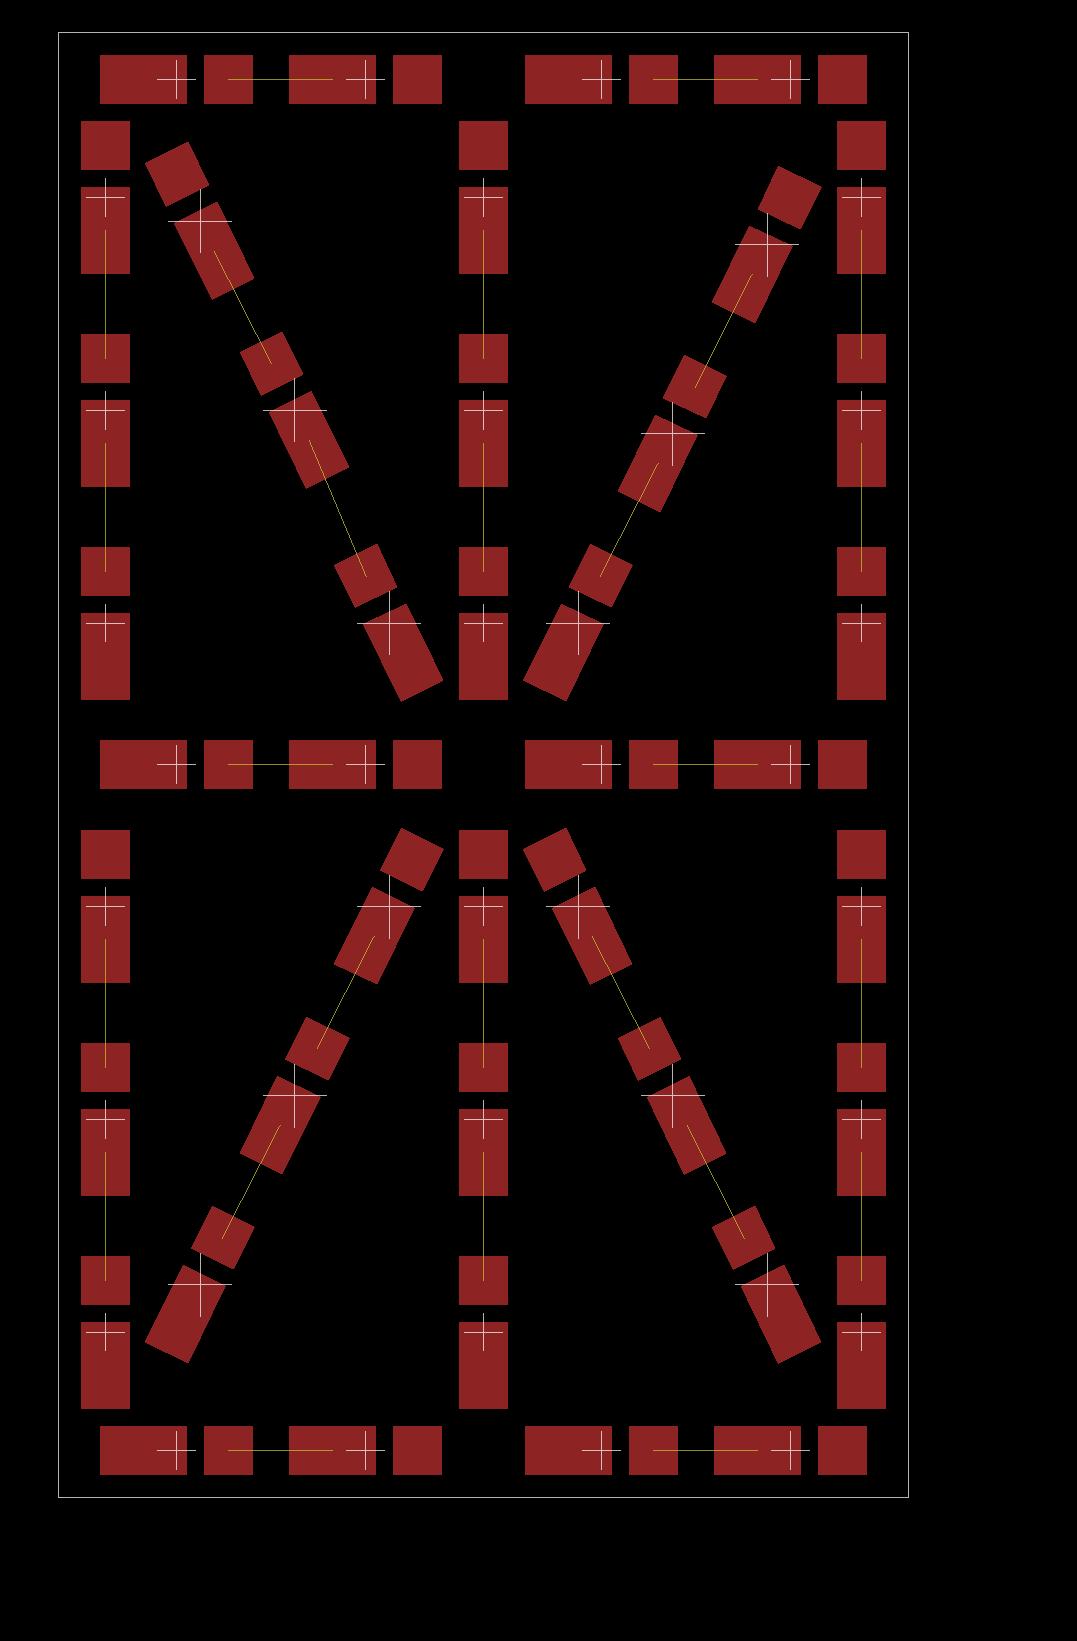 led-segment-display-pcb